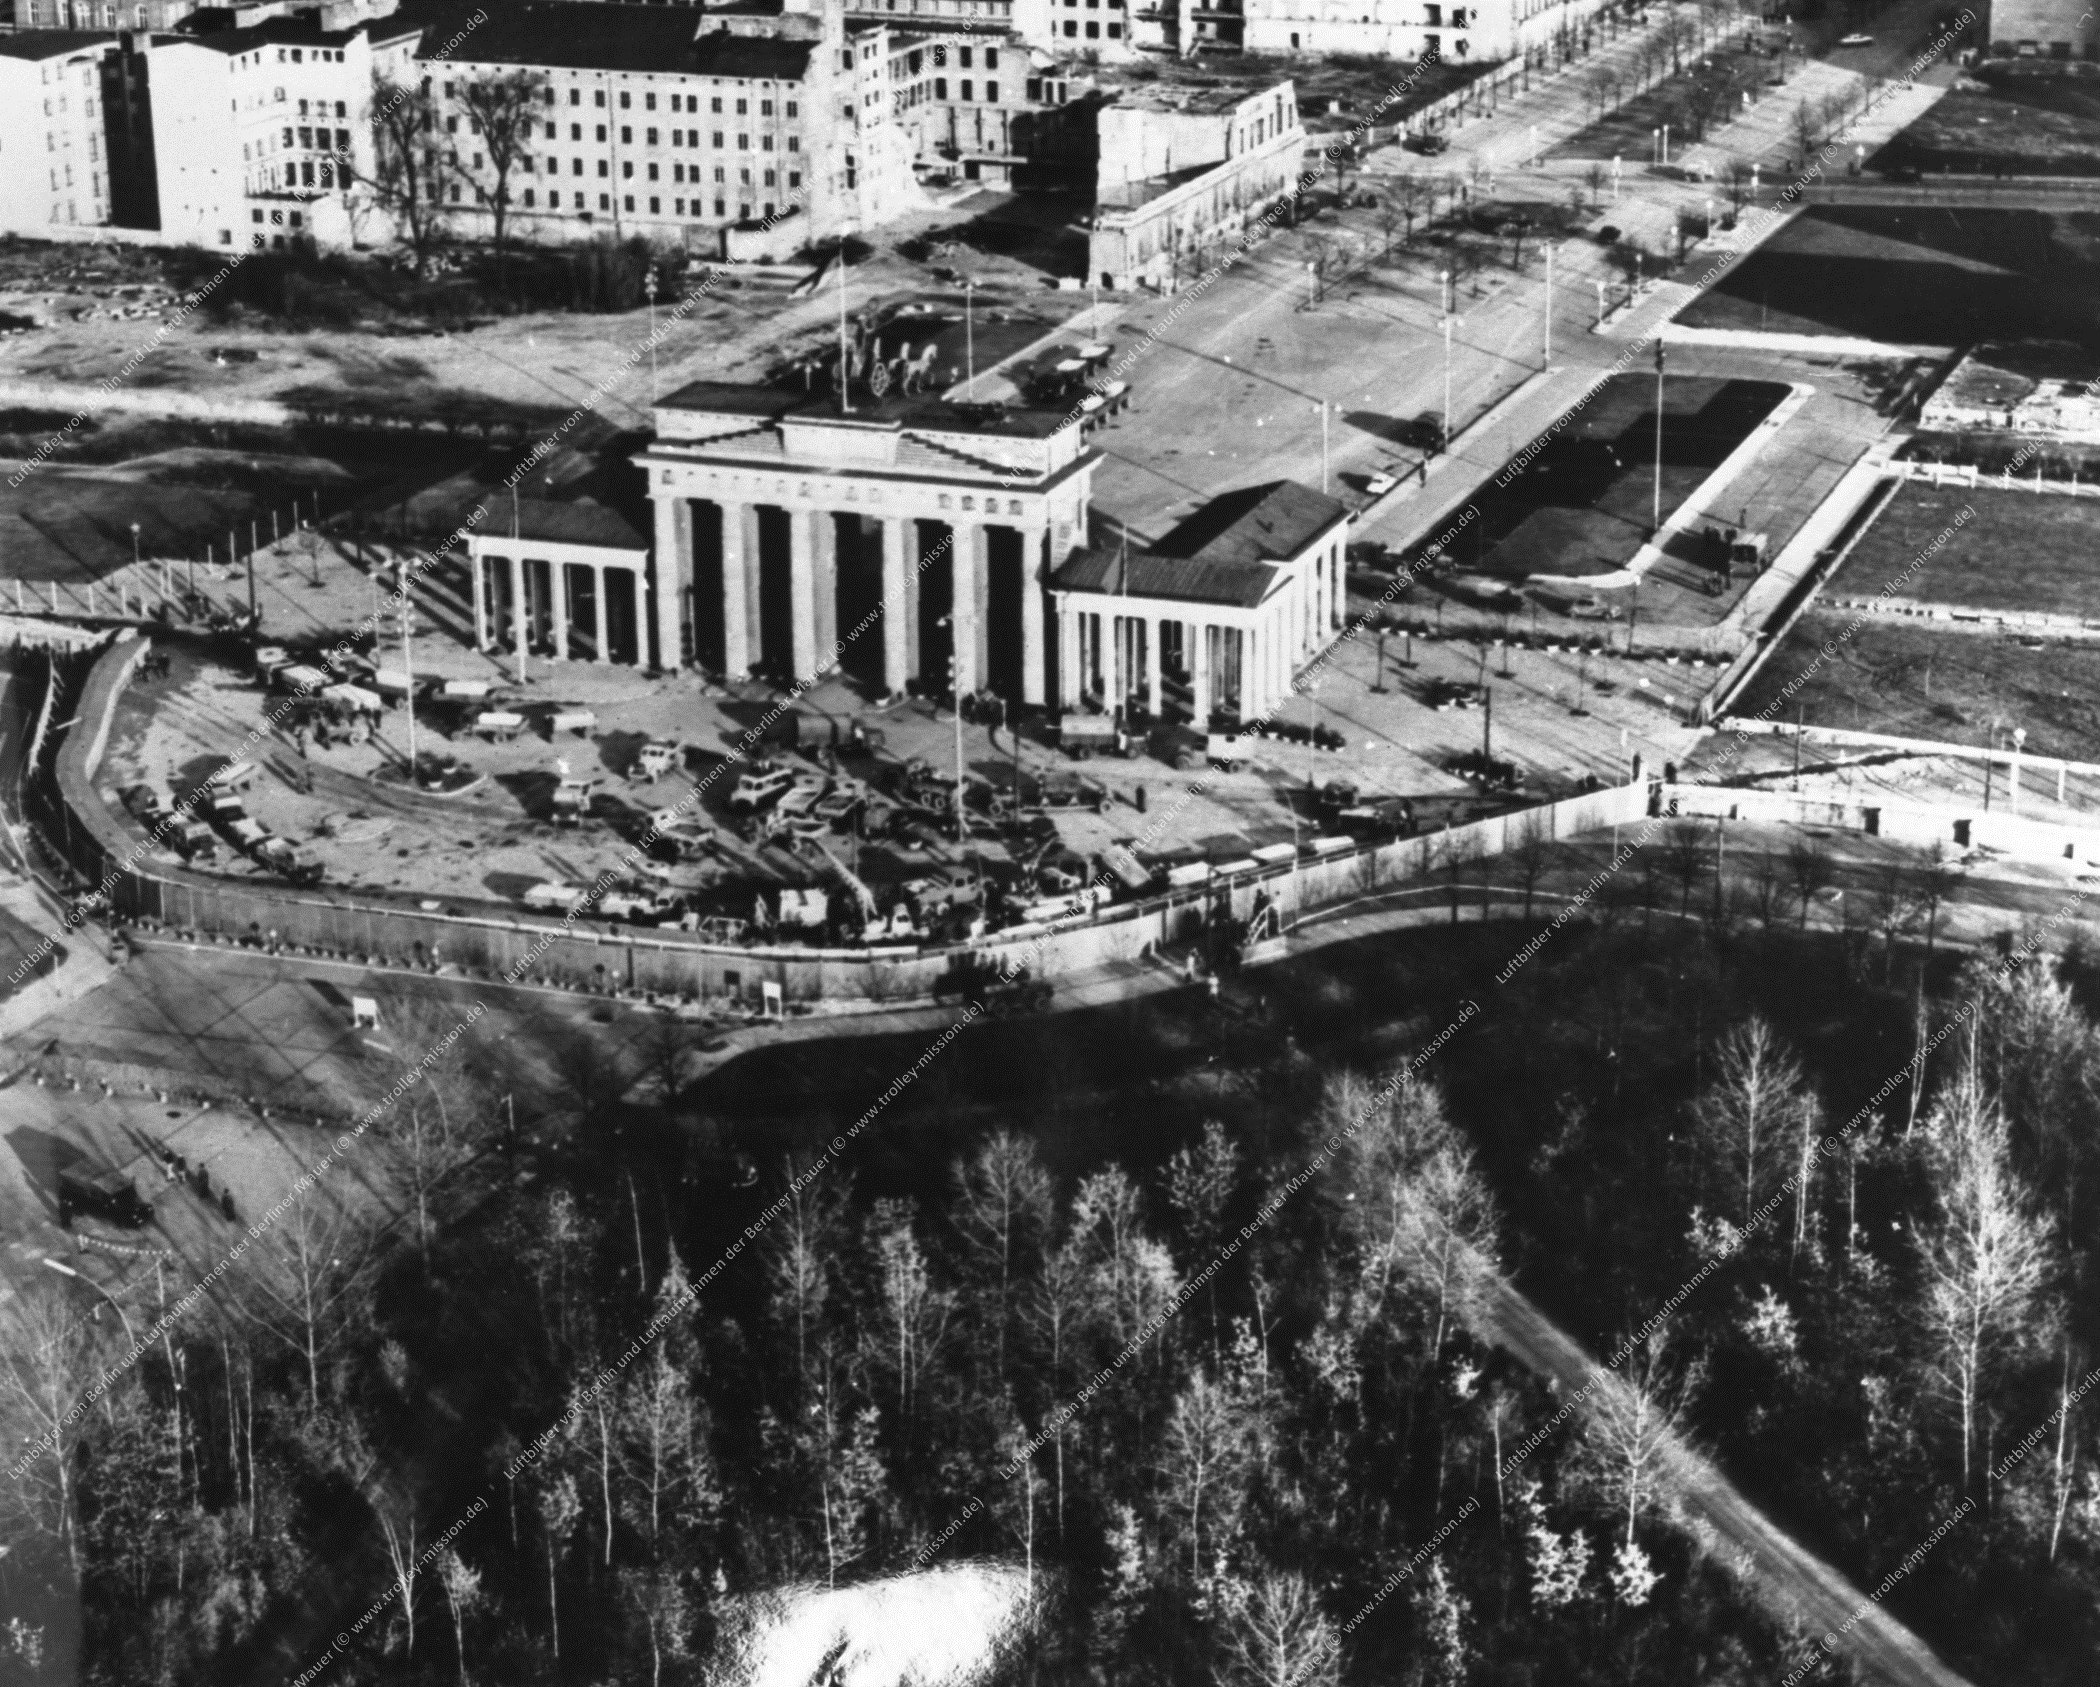 Berlin Luftbild Brandenburger Tor (Bild 012)